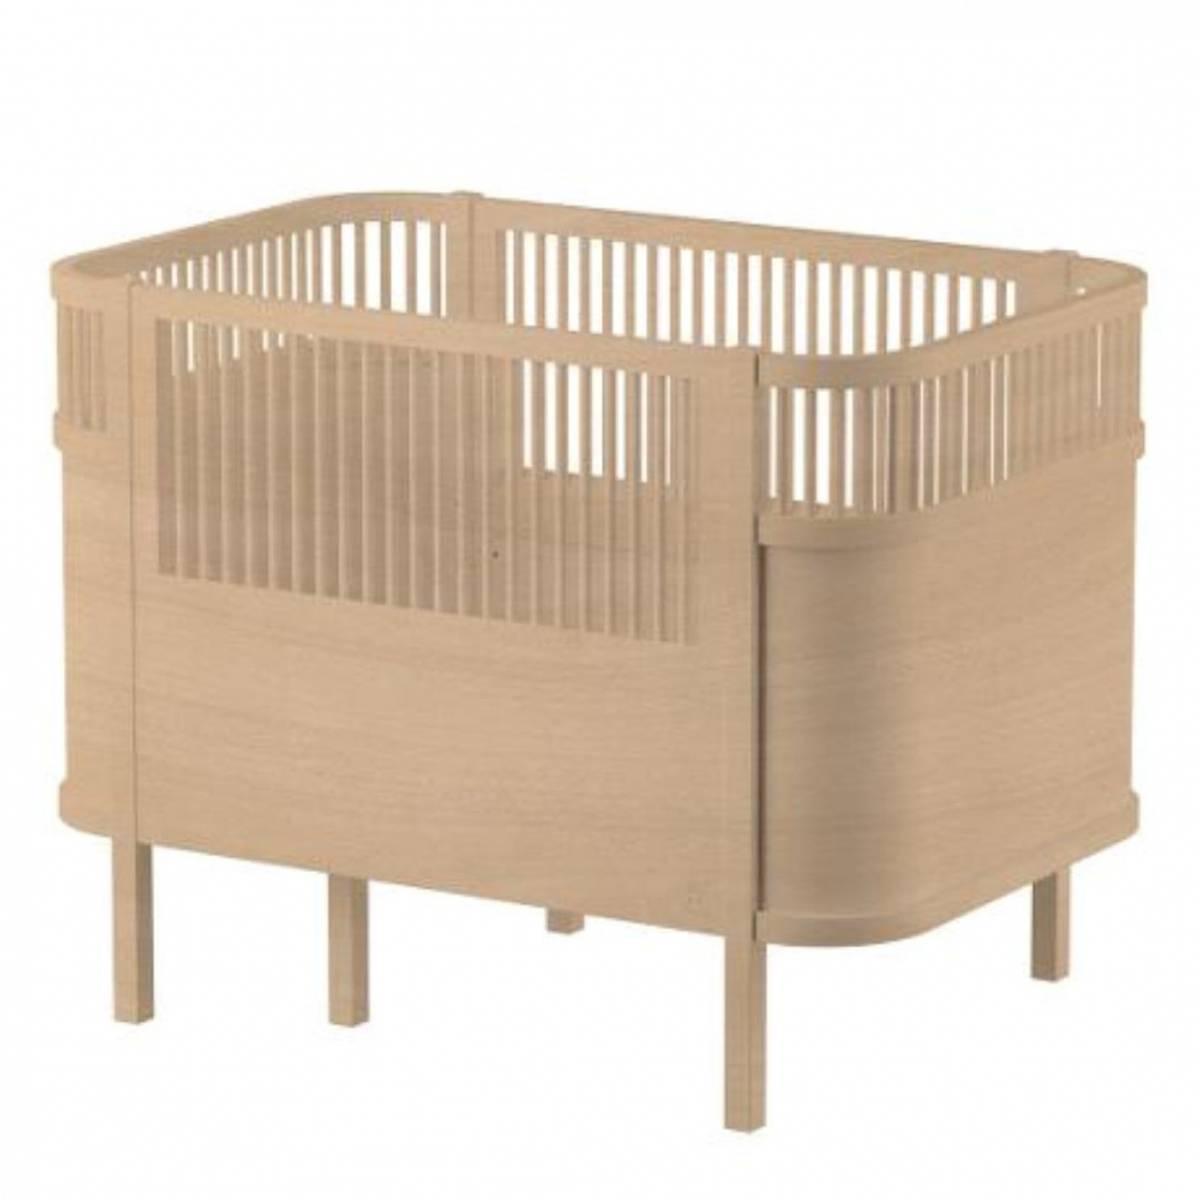 sebra seng Baby & classic Wooden edition